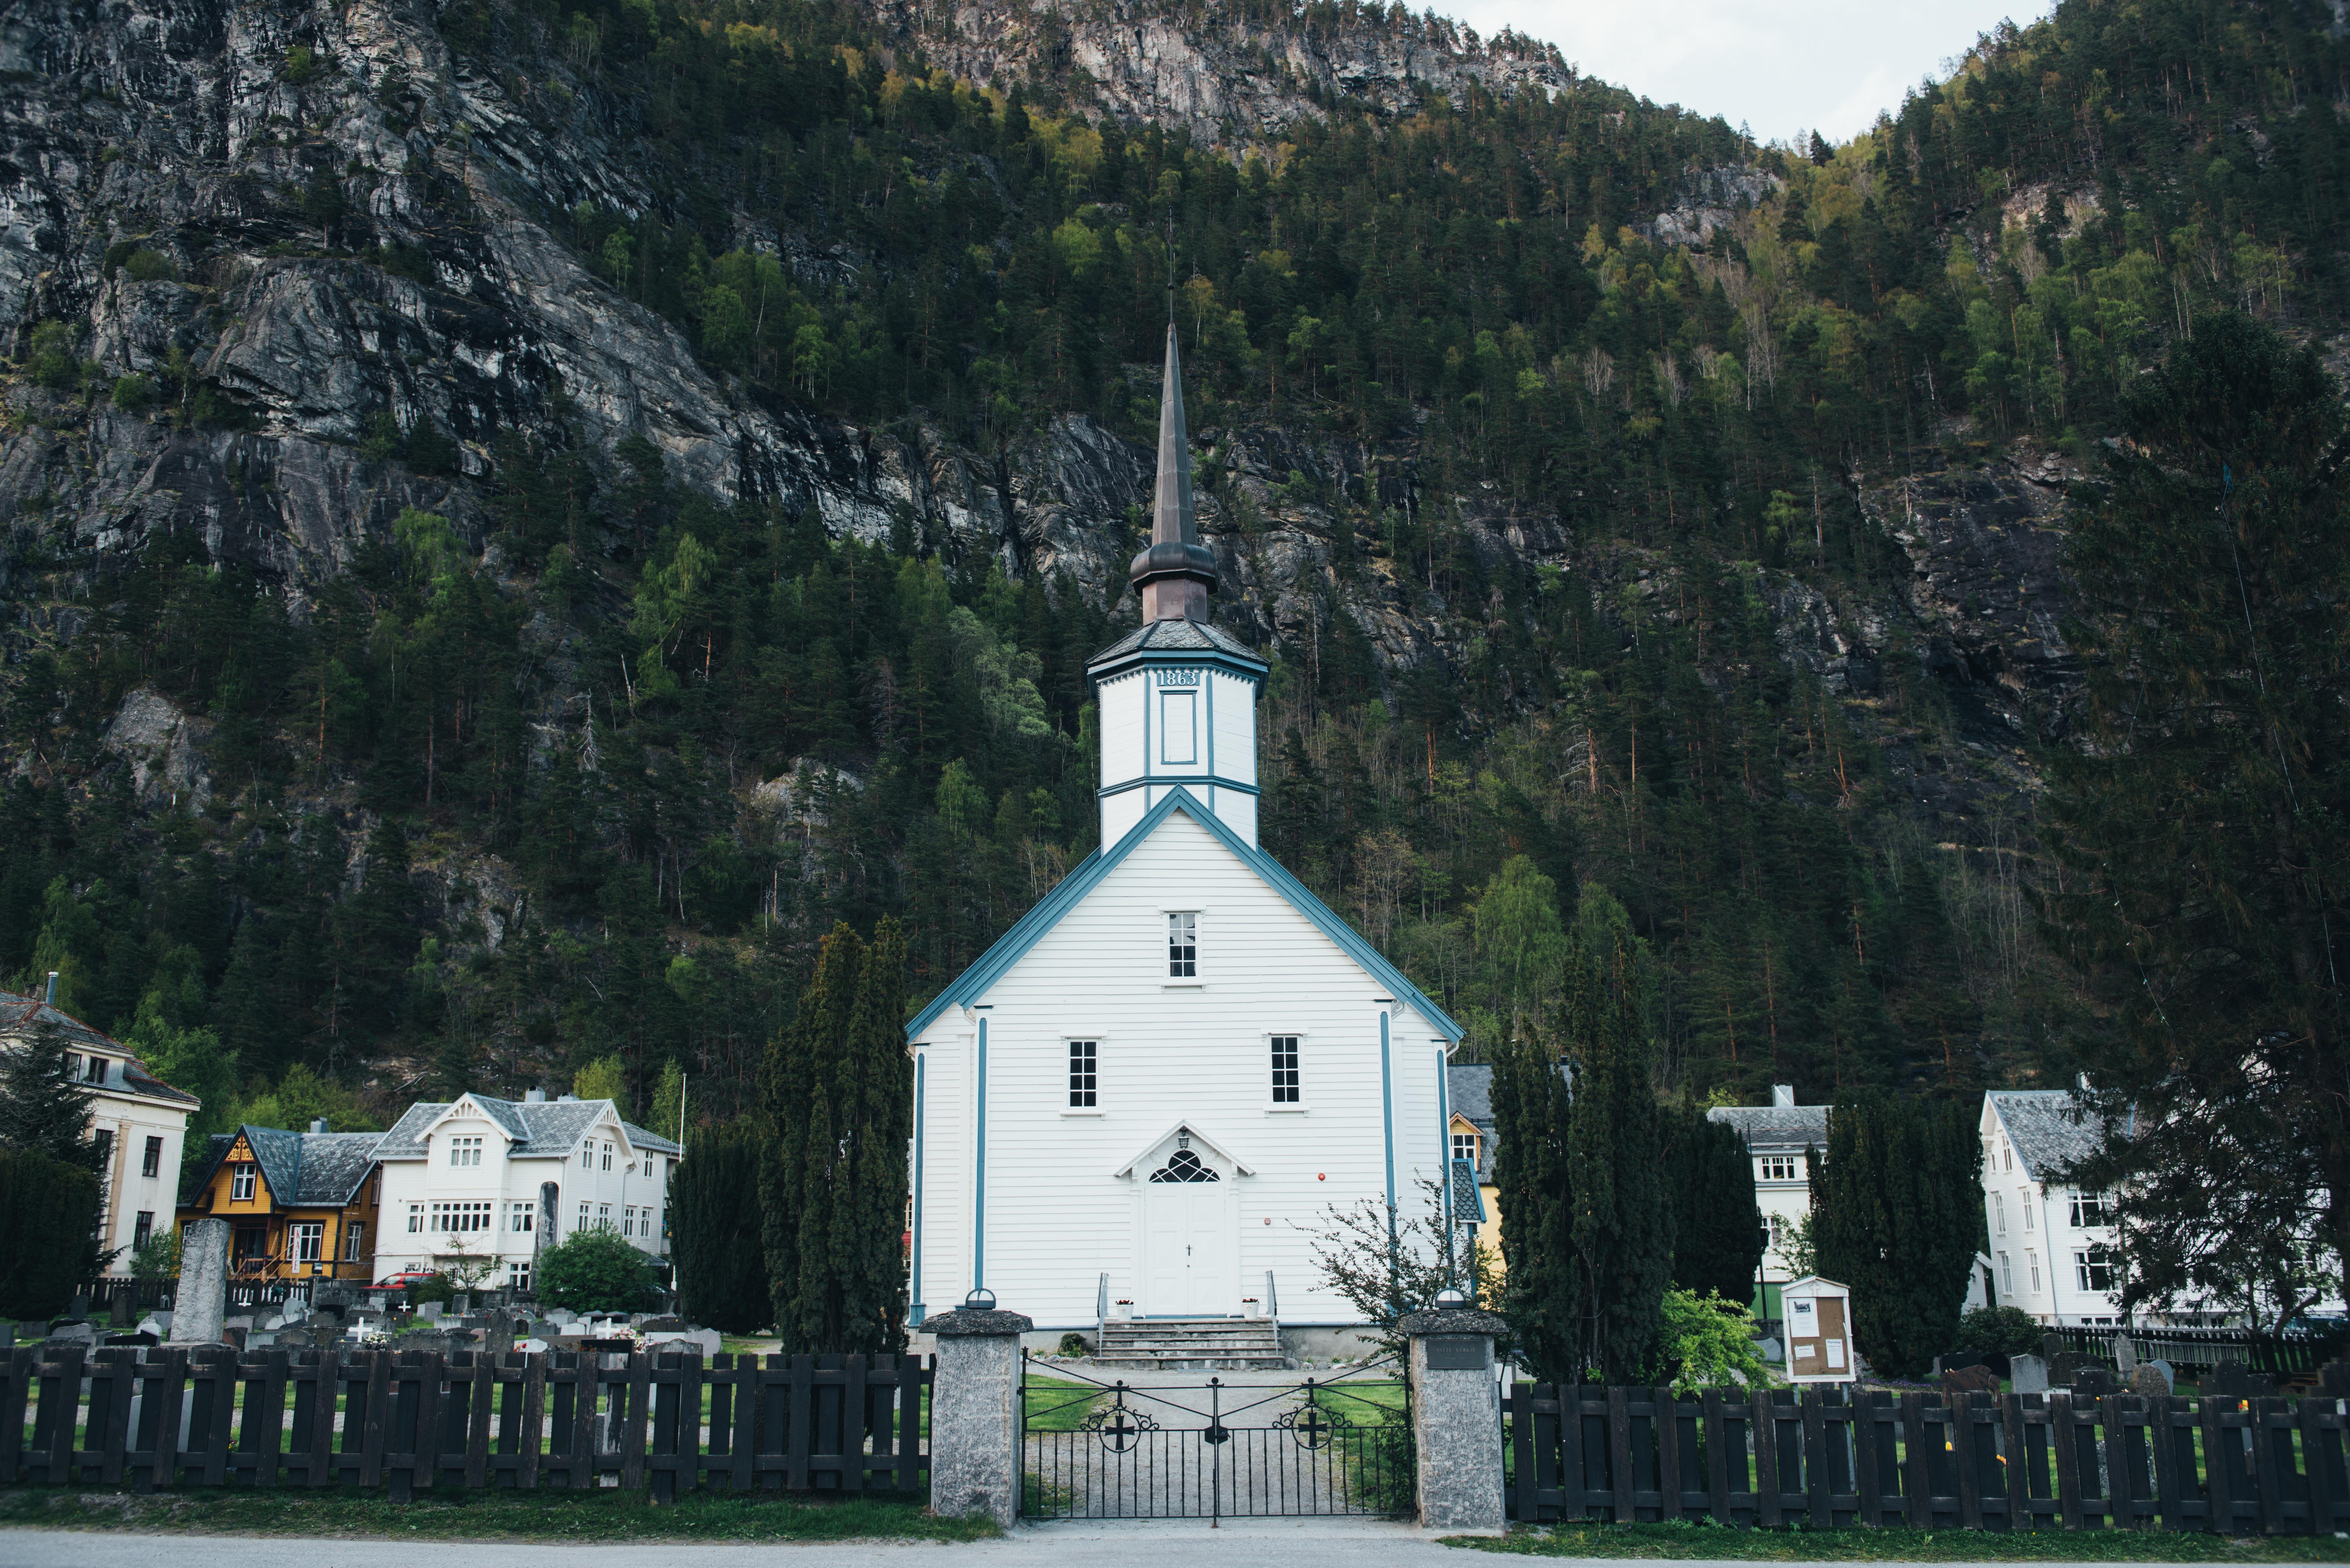 Landscape, Building, Church, Mountain, Peace, HQ Photo